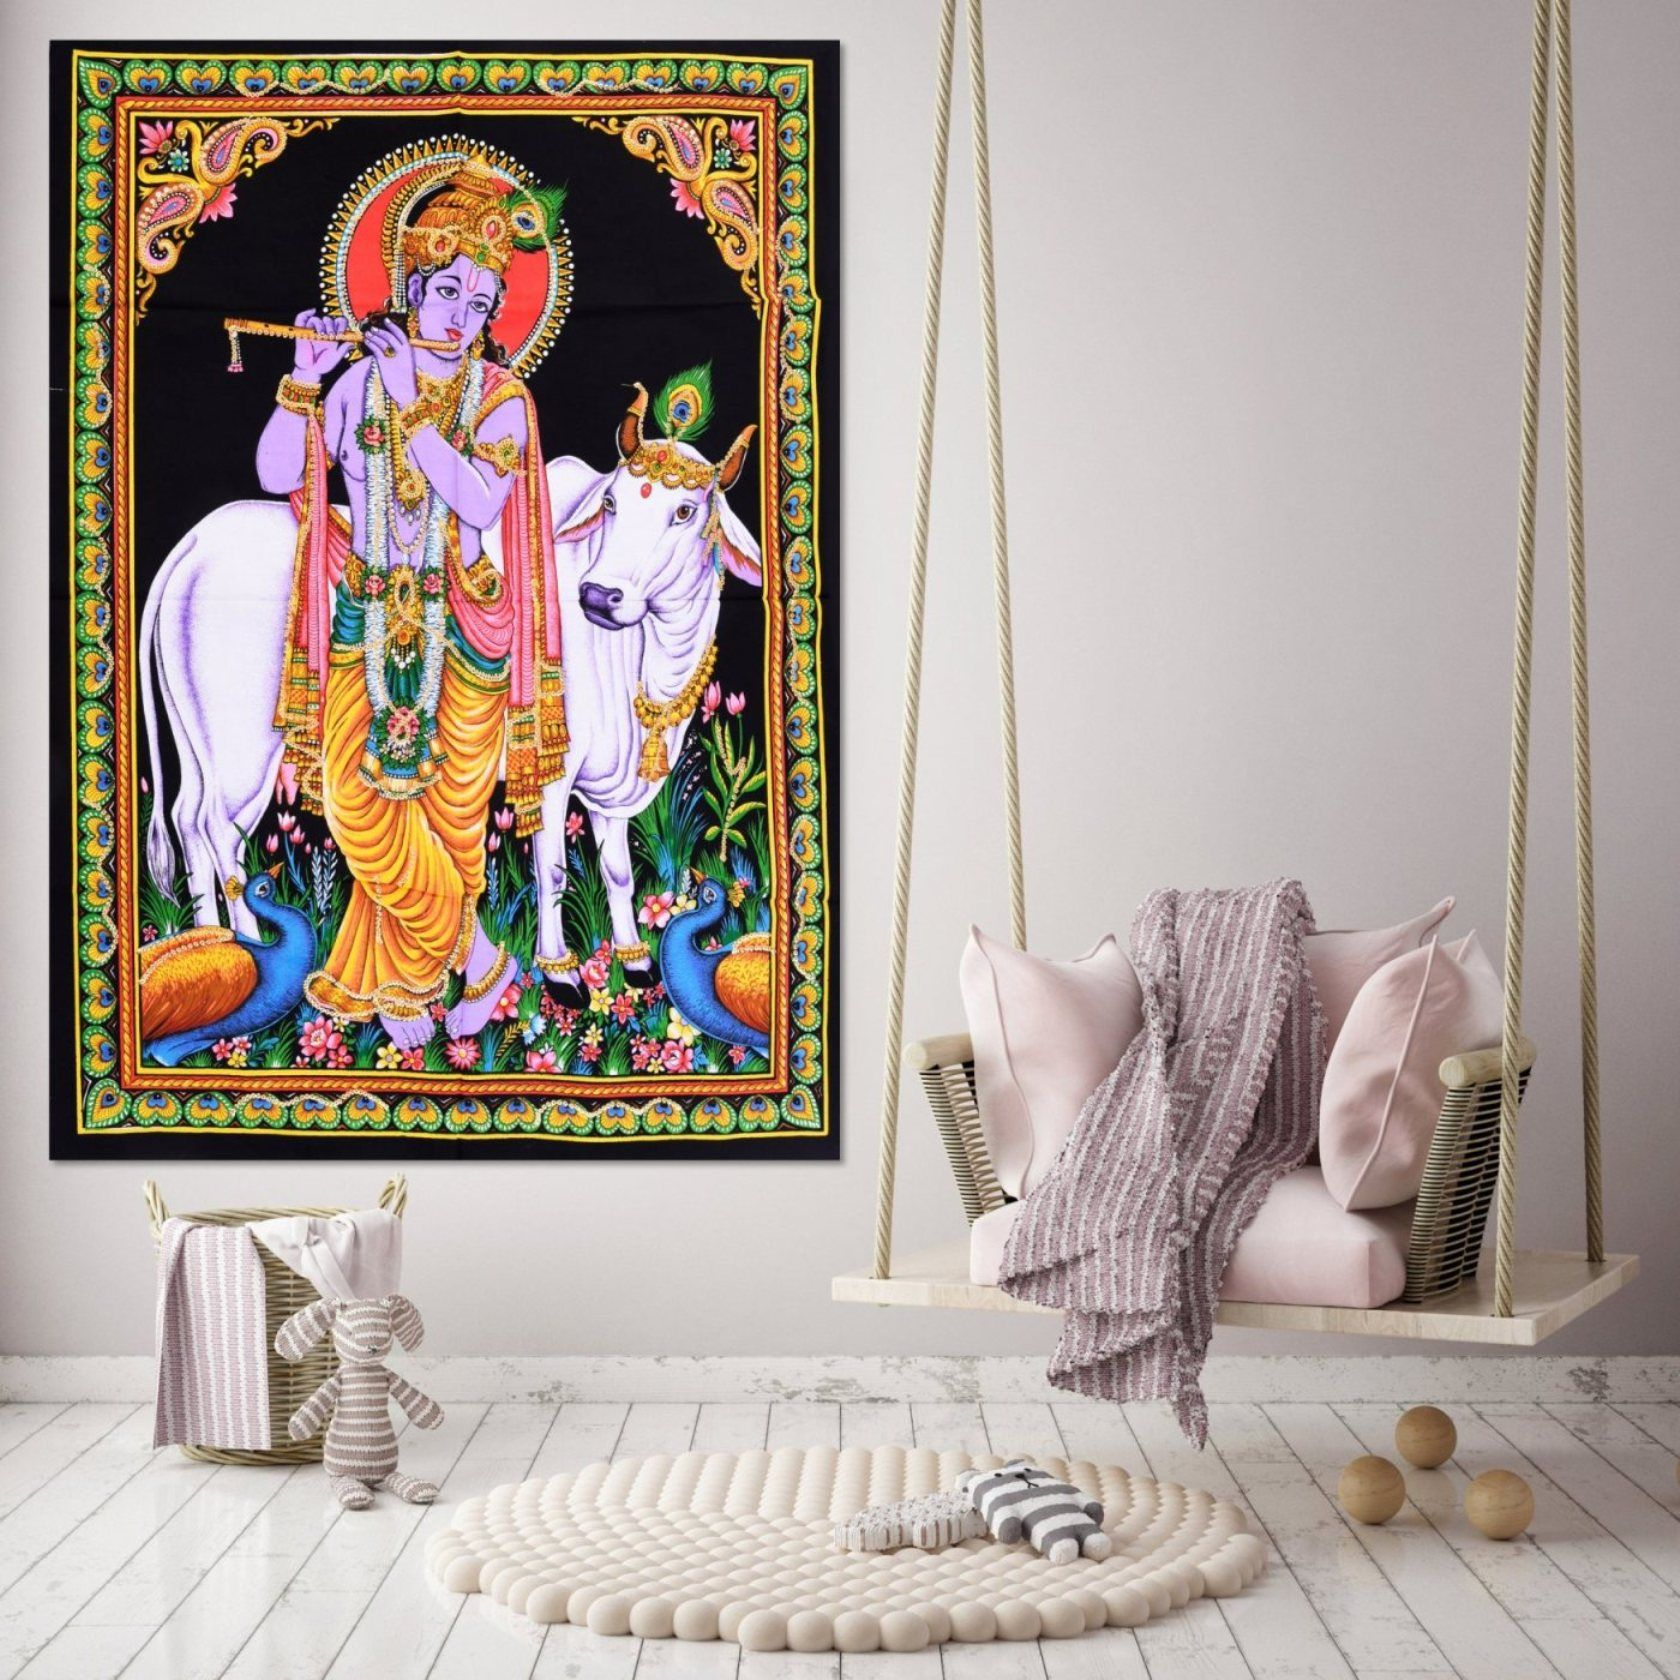 Indian Mandala Skull Printed Cotton Wall Hanging Yoga Mat Decor Poster Tapestry